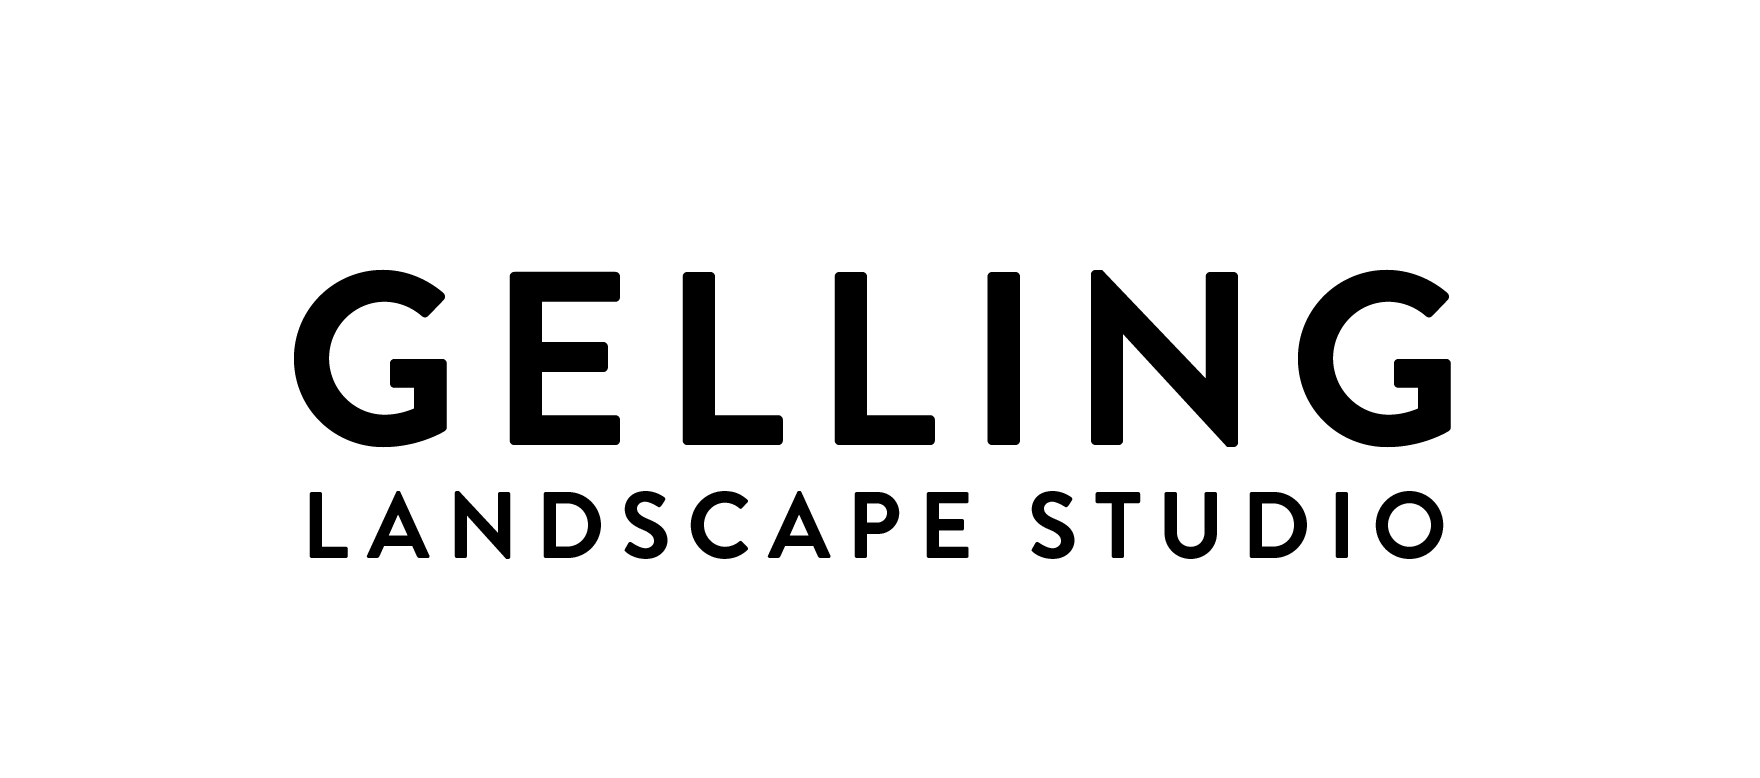 GELLING LANDSCAPE STUDIO